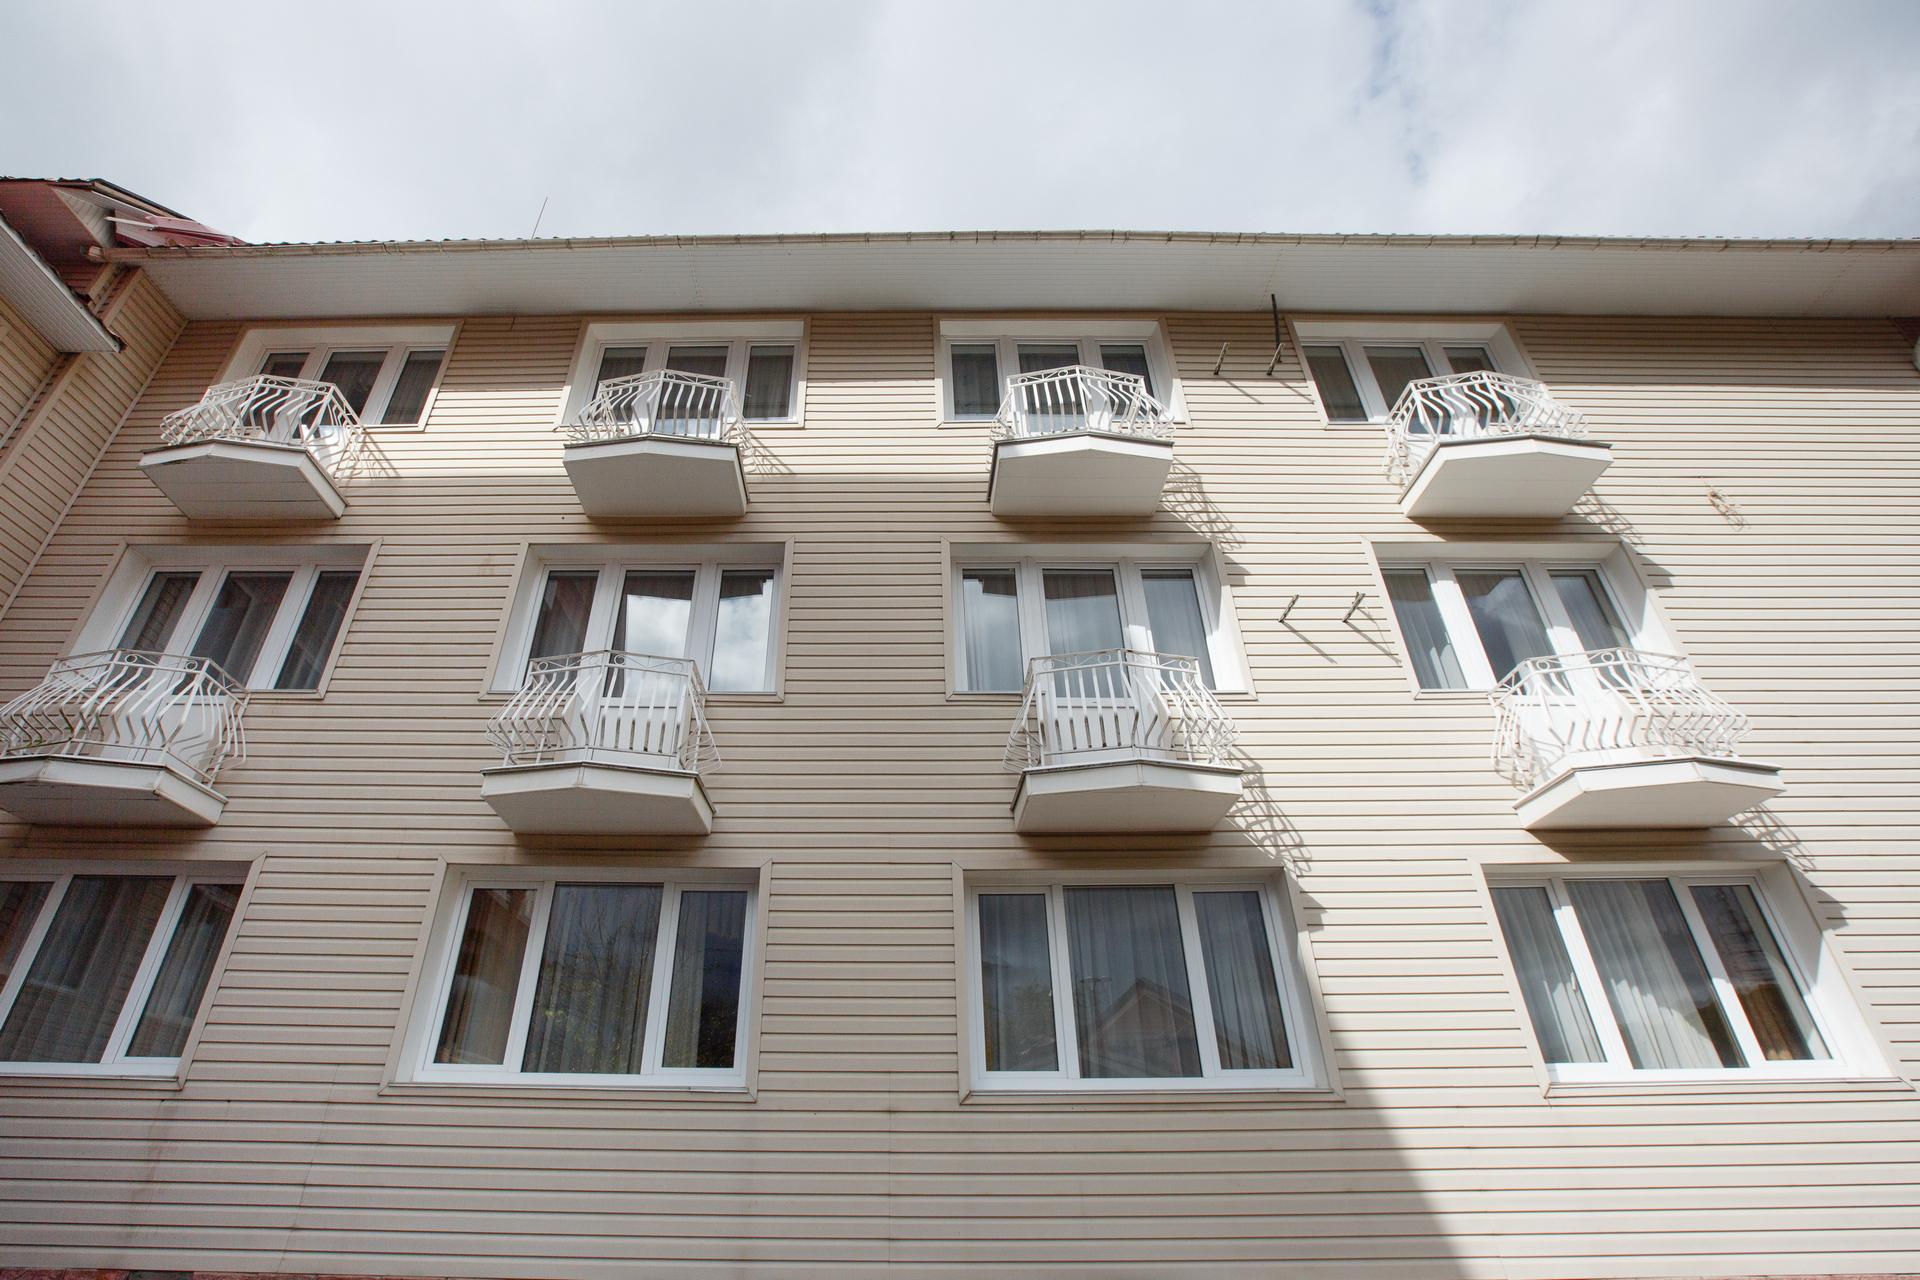 Уютная Вилла в Красной Поляне - image Uyutnaya-Villa-v-Krasnoj-Polyane-5 on https://bizneskvartal.ru